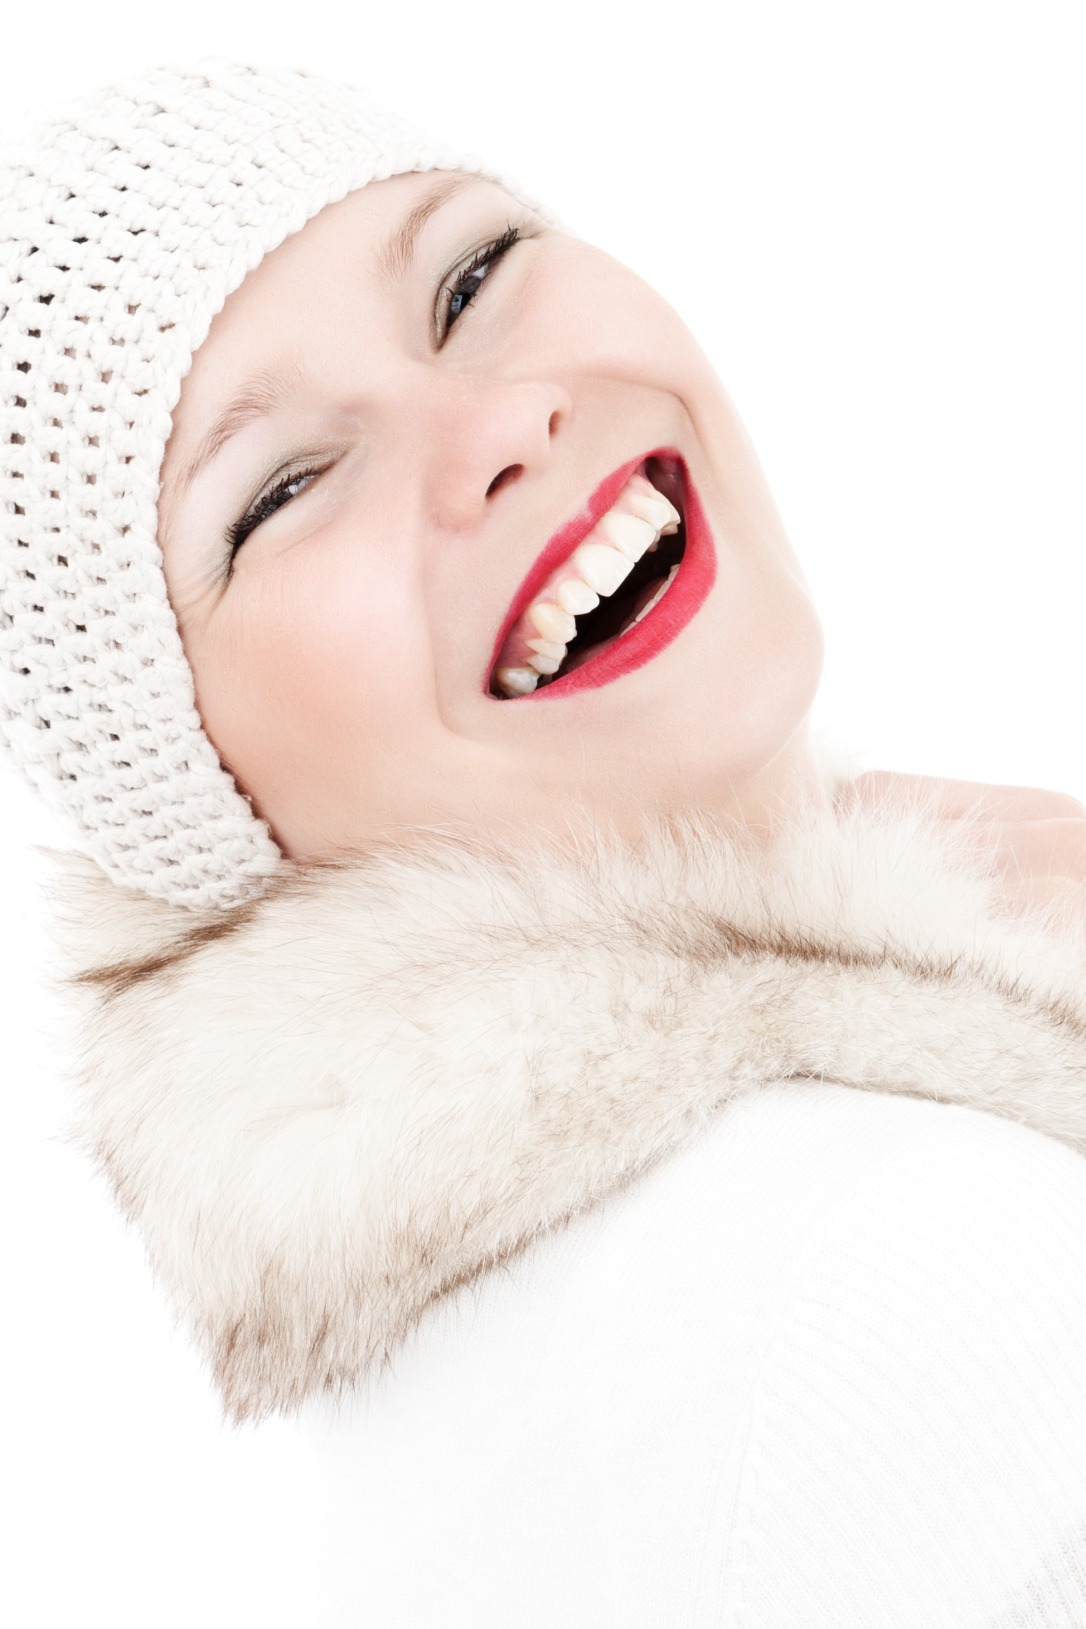 beauty_cold_elegance